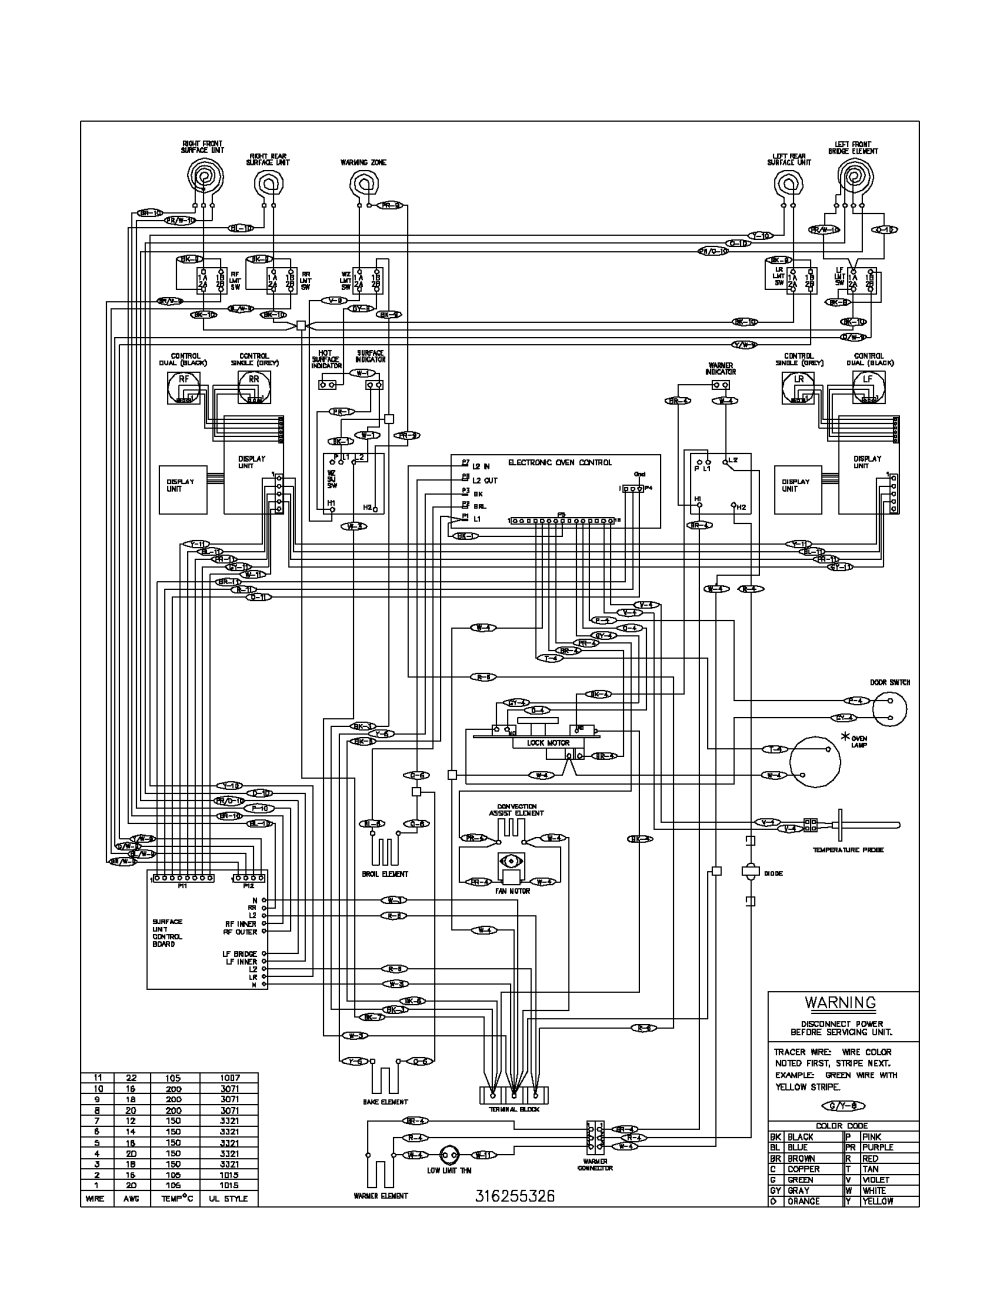 medium resolution of wiring diagram for frigidaire stove wiring diagram todays rh 7 18 12 1813weddingbarn com frigidaire washer